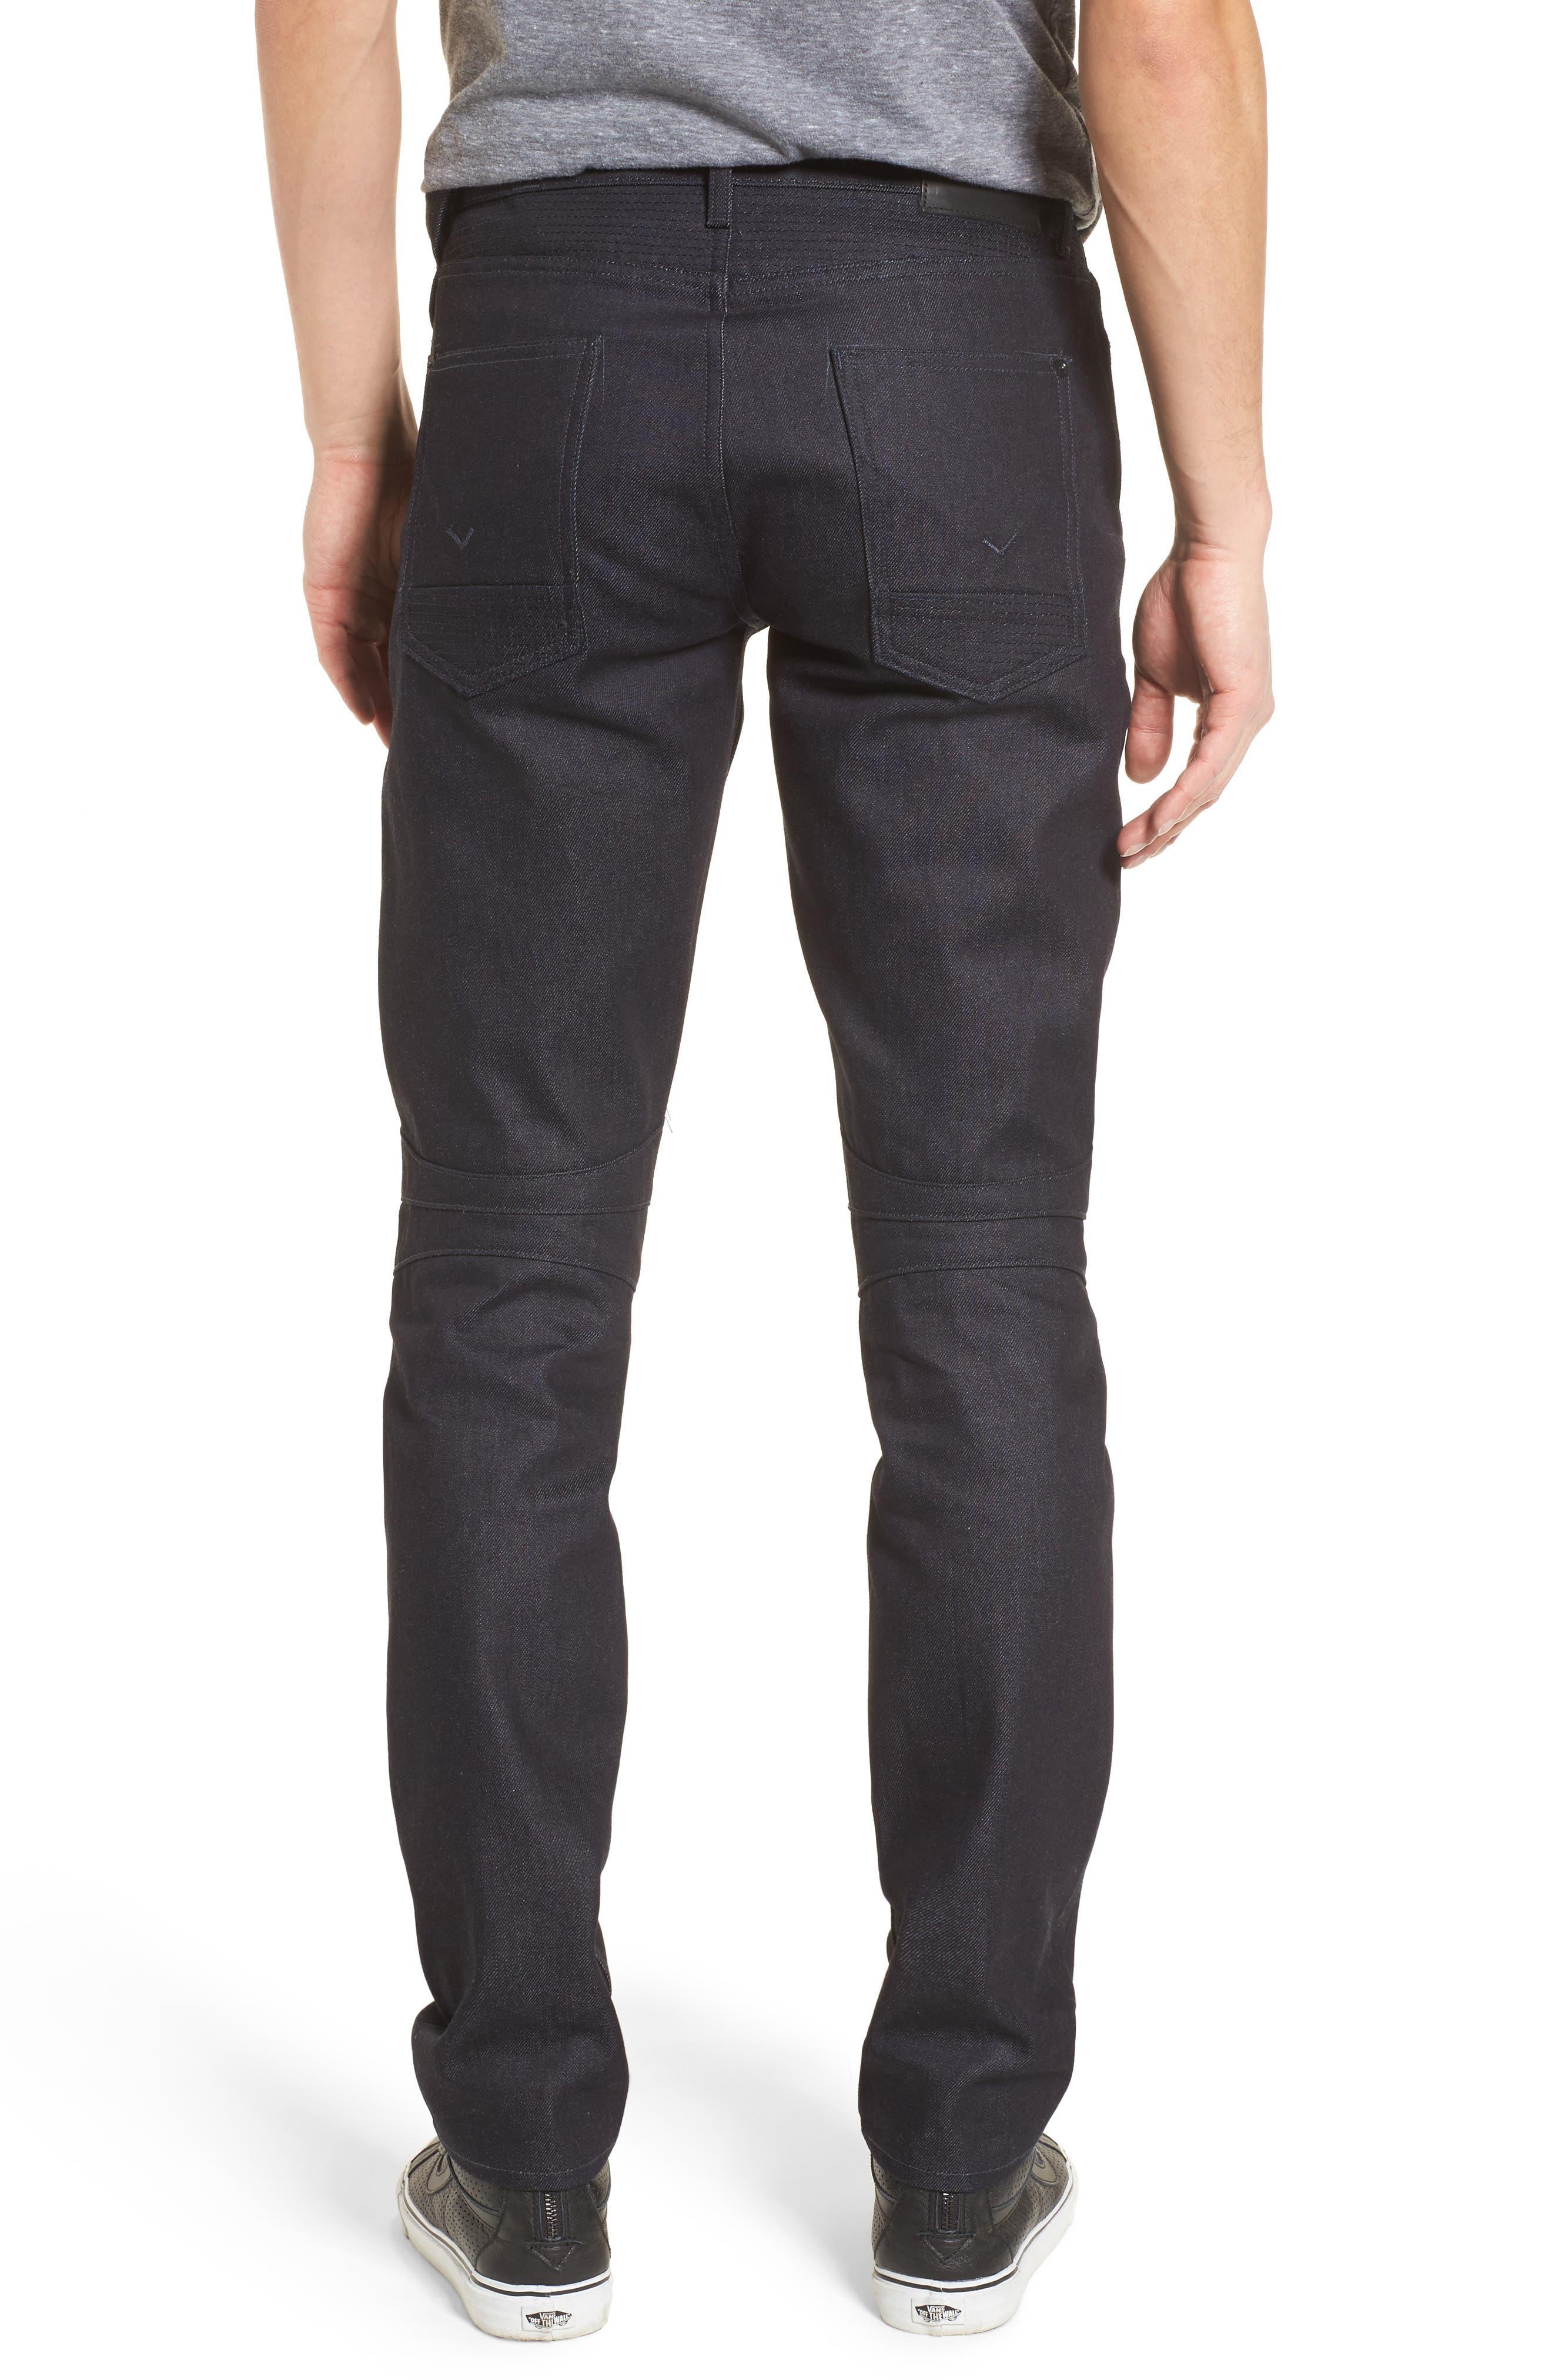 Blinder Biker Skinny Fit Jeans,                             Alternate thumbnail 2, color,                             Raw